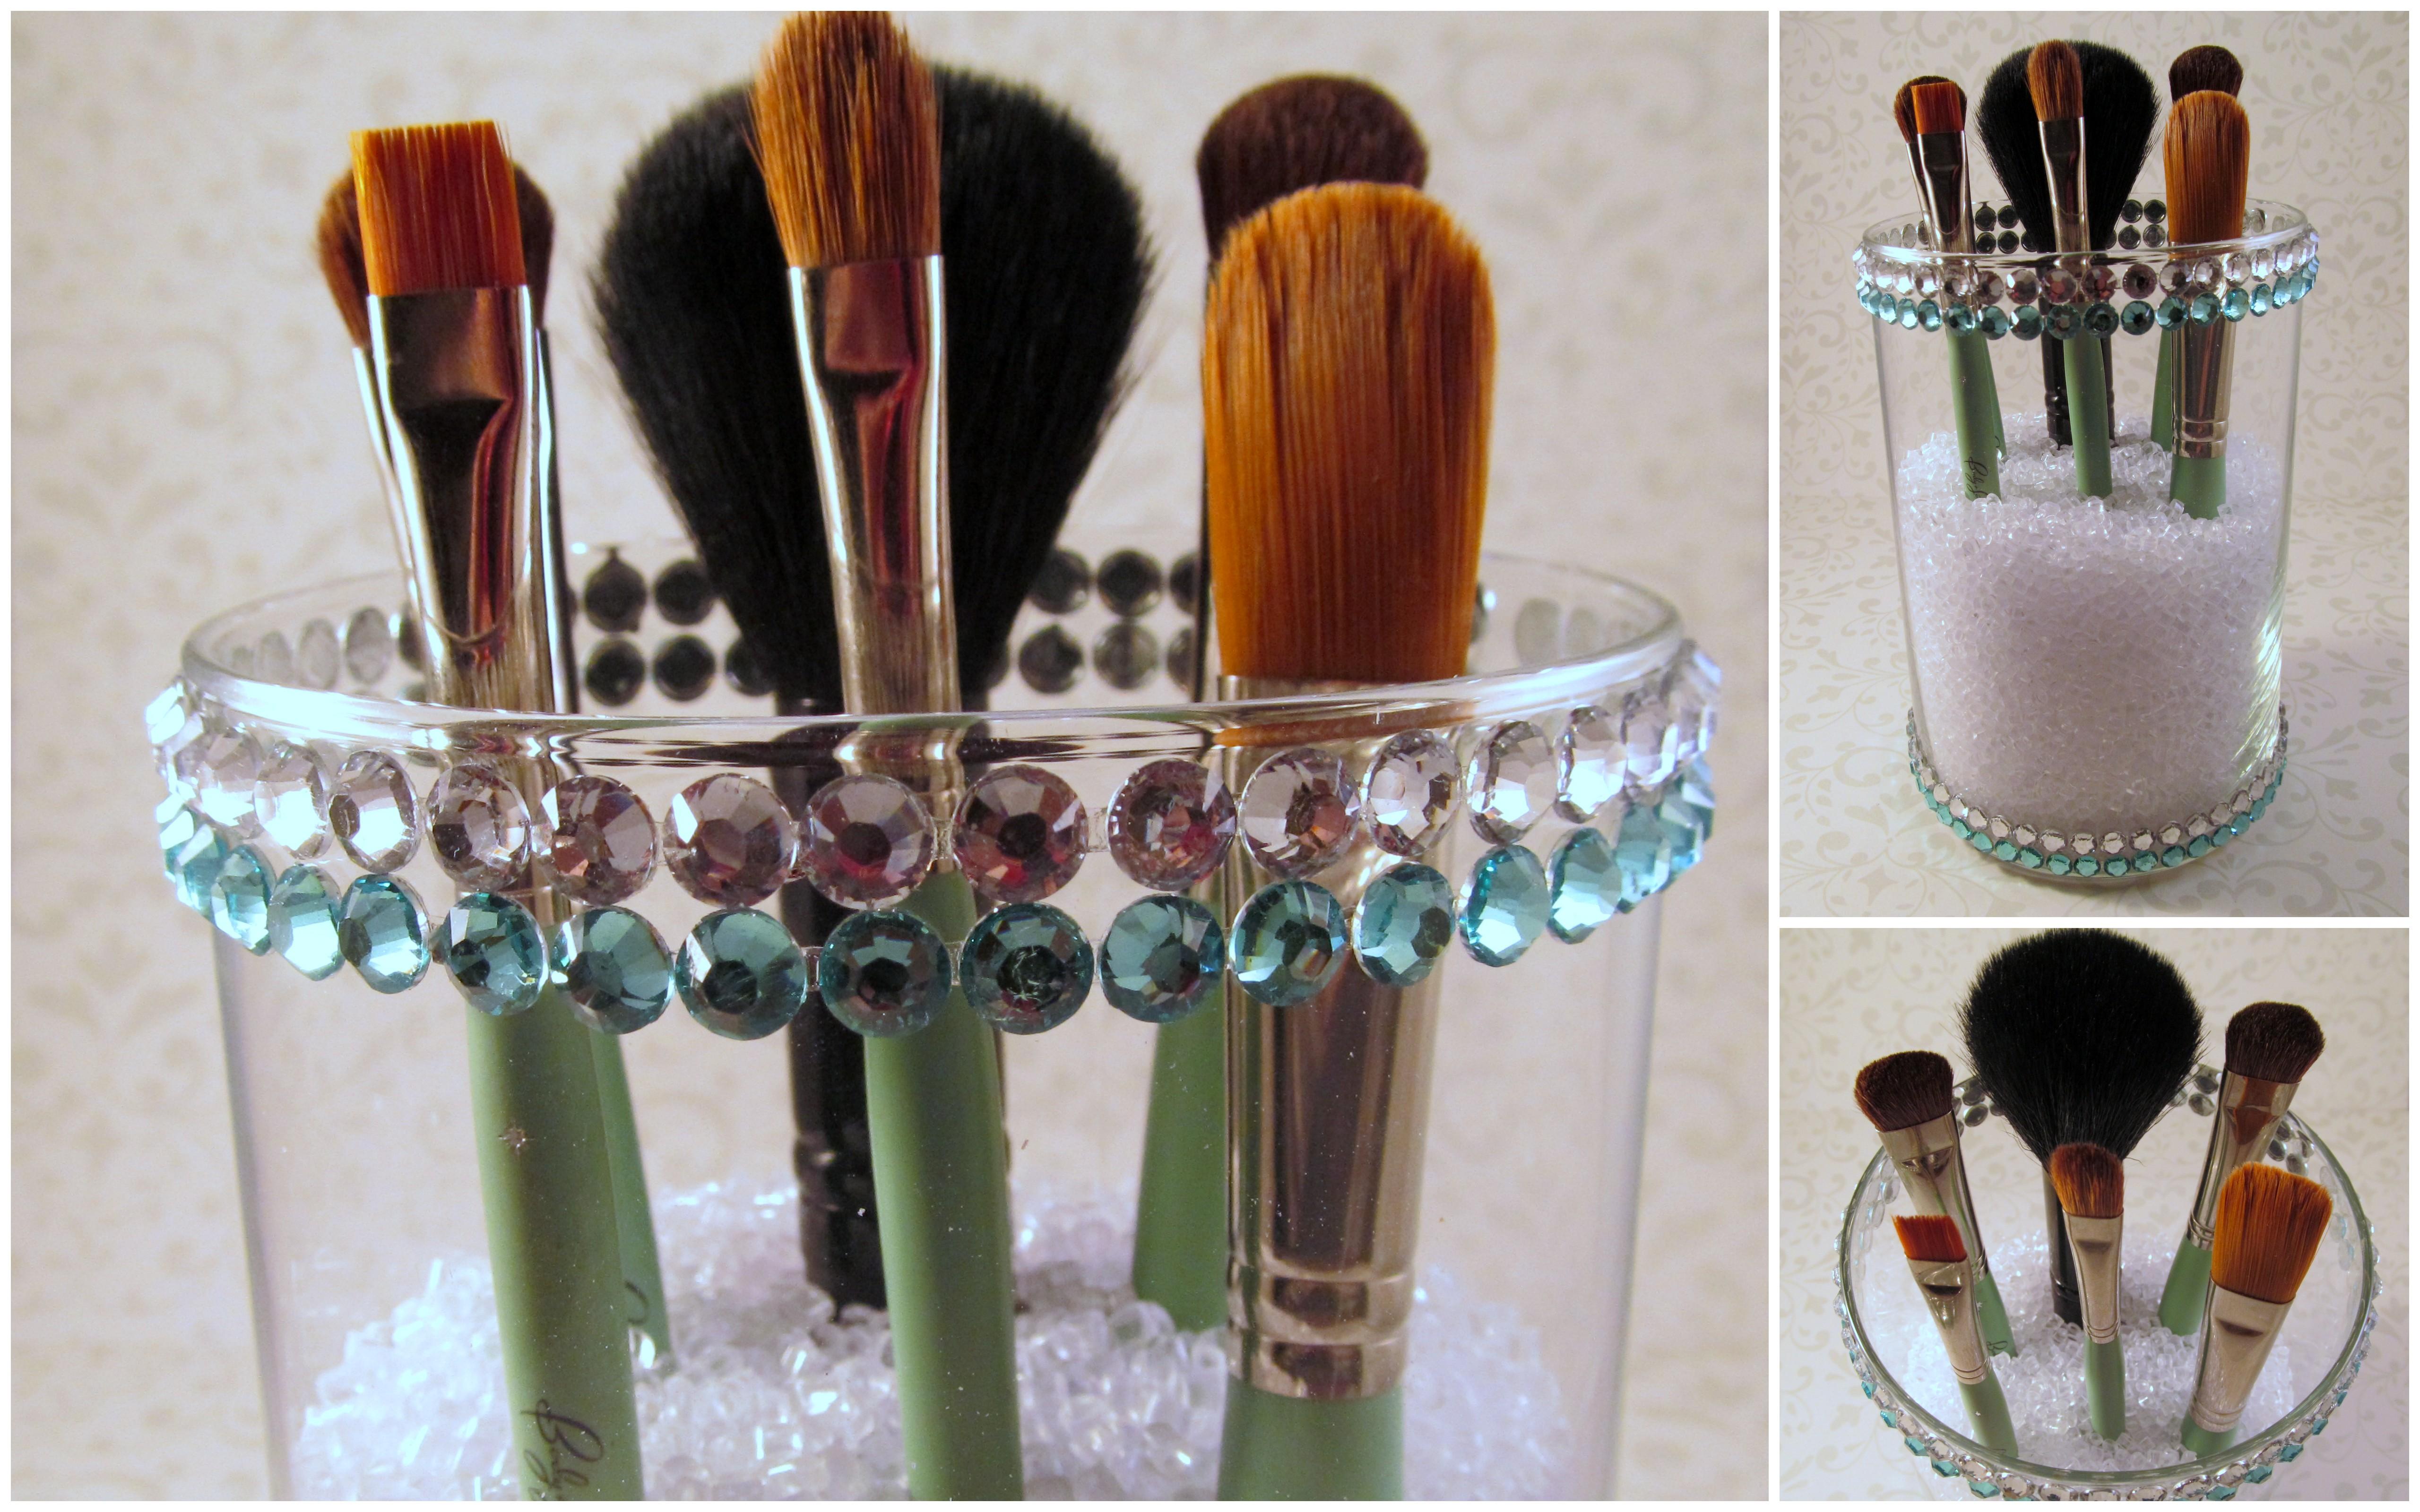 brush holder beads. brush-holder brush holder beads a